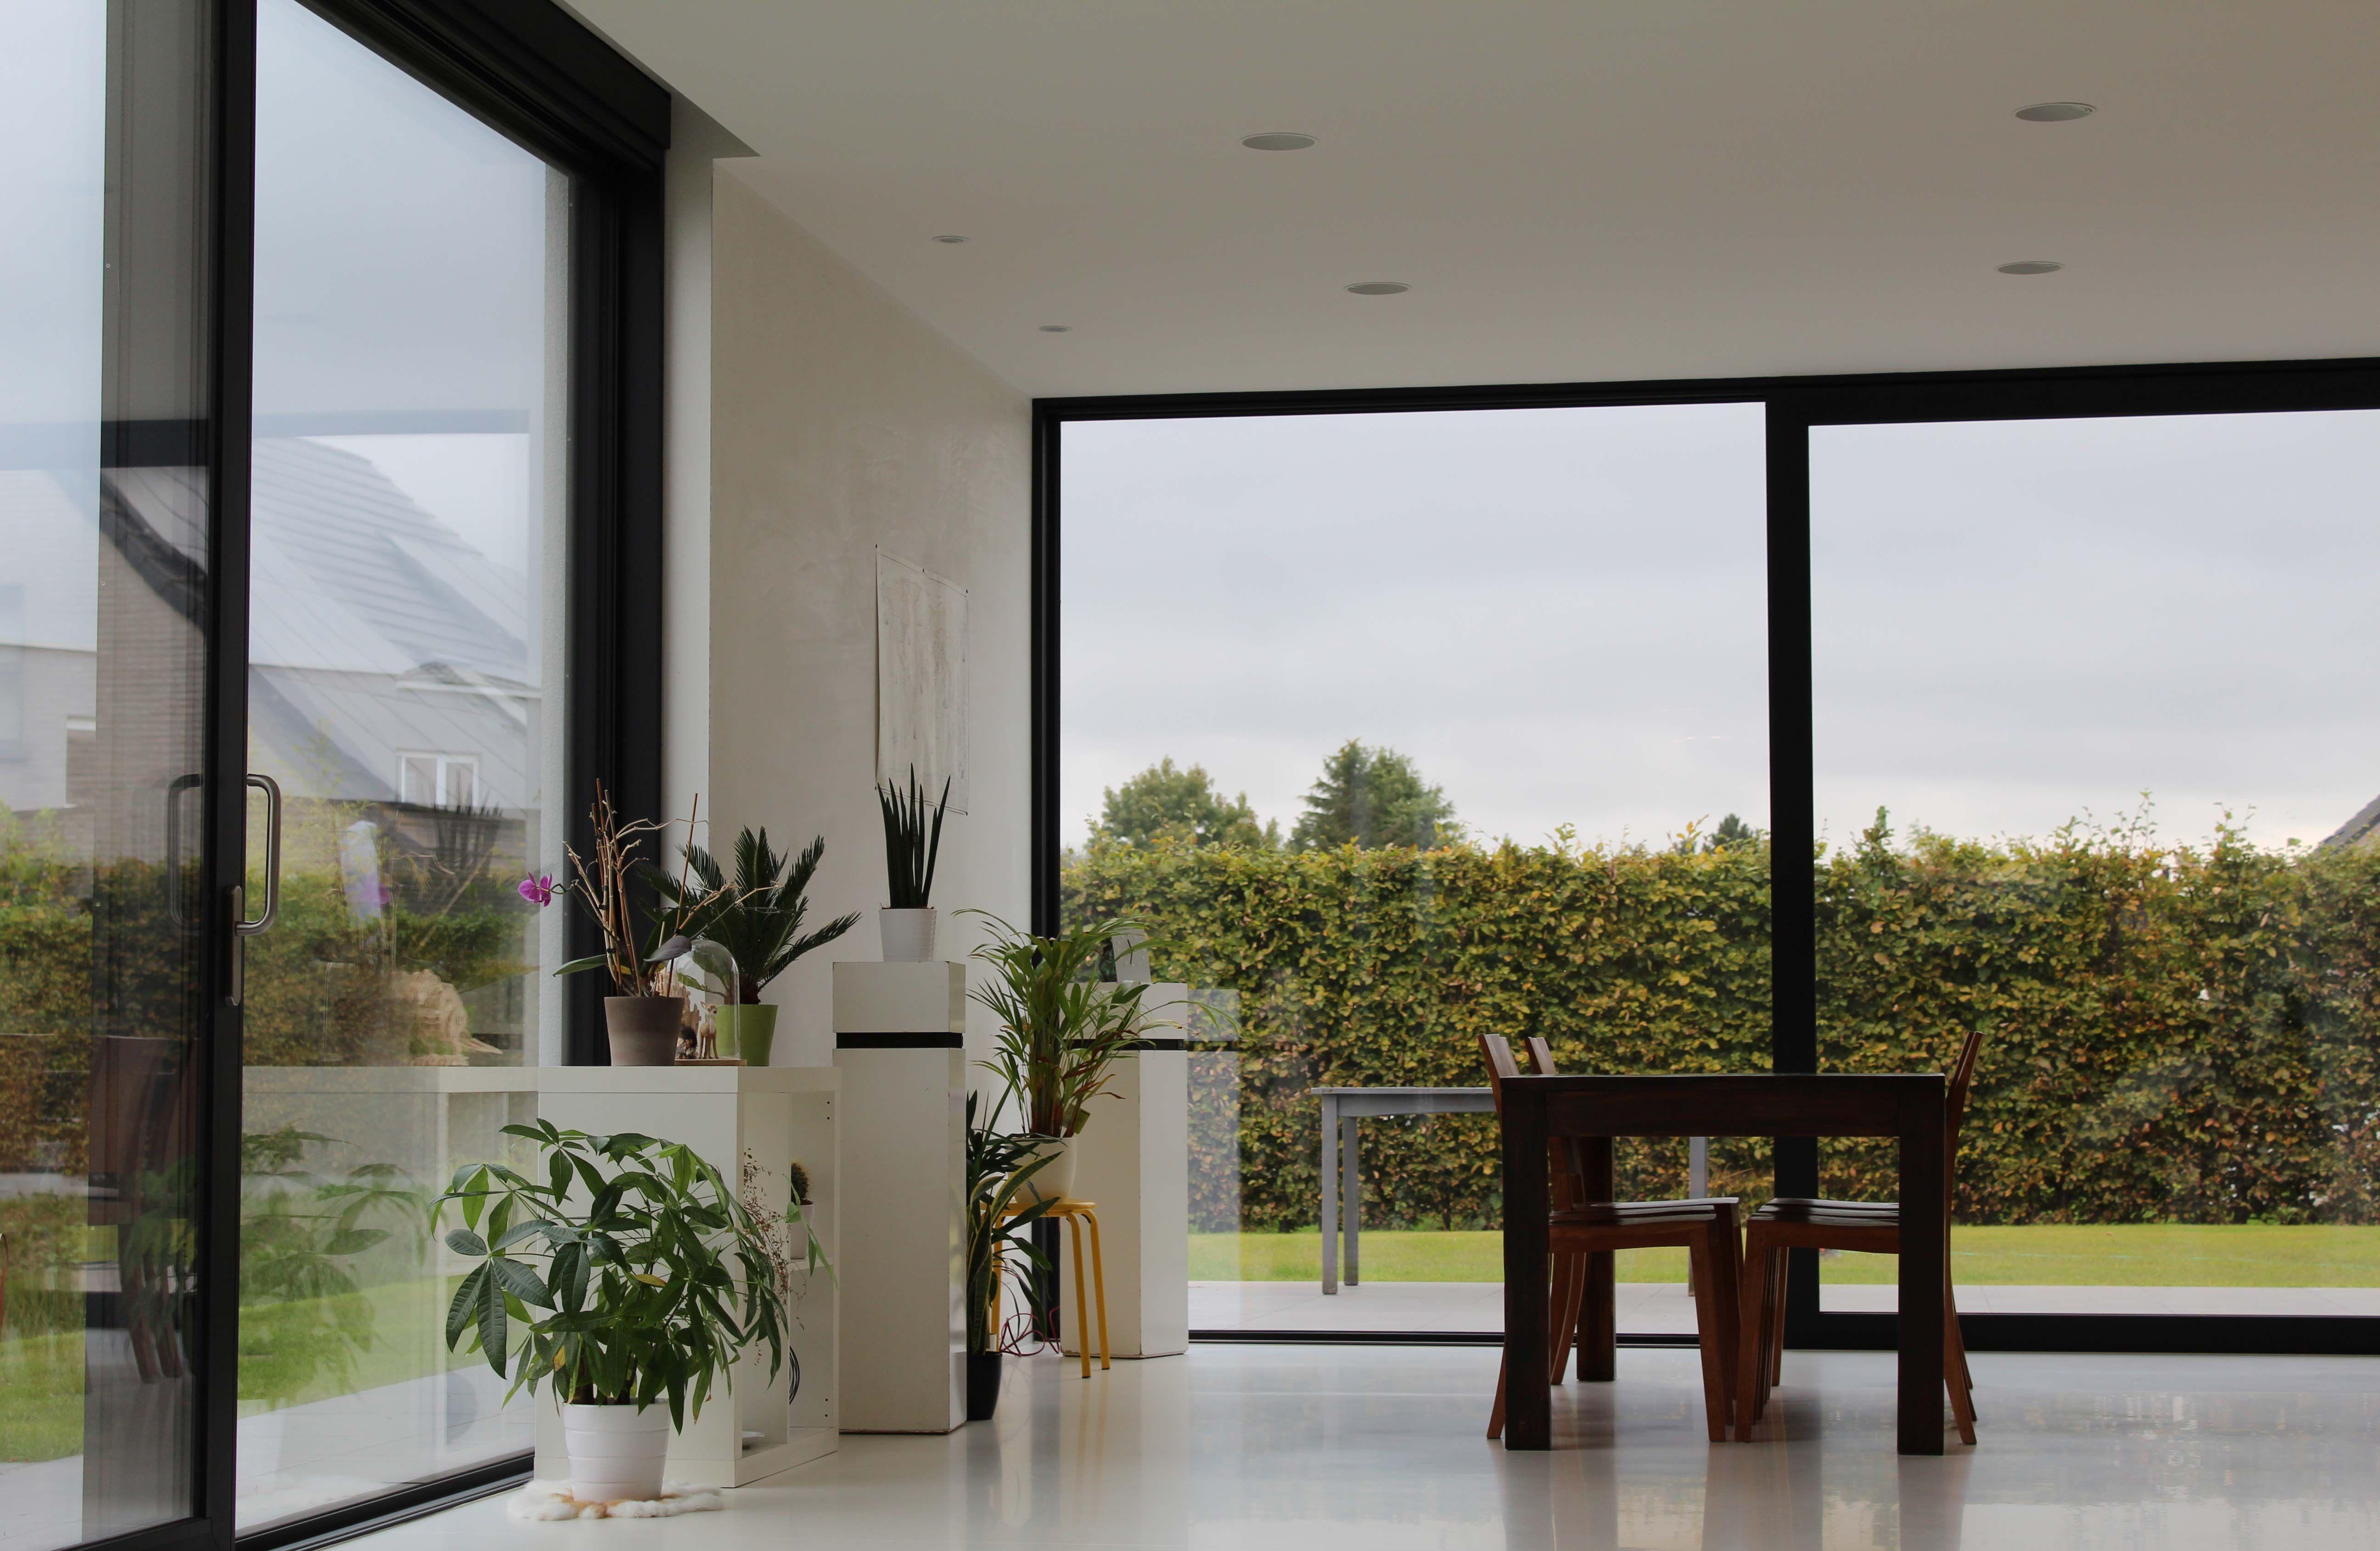 Nieuwbouw vrijstaande woning – Ypsilon architecten, licht & zicht - witte gietvloer - schuiframen